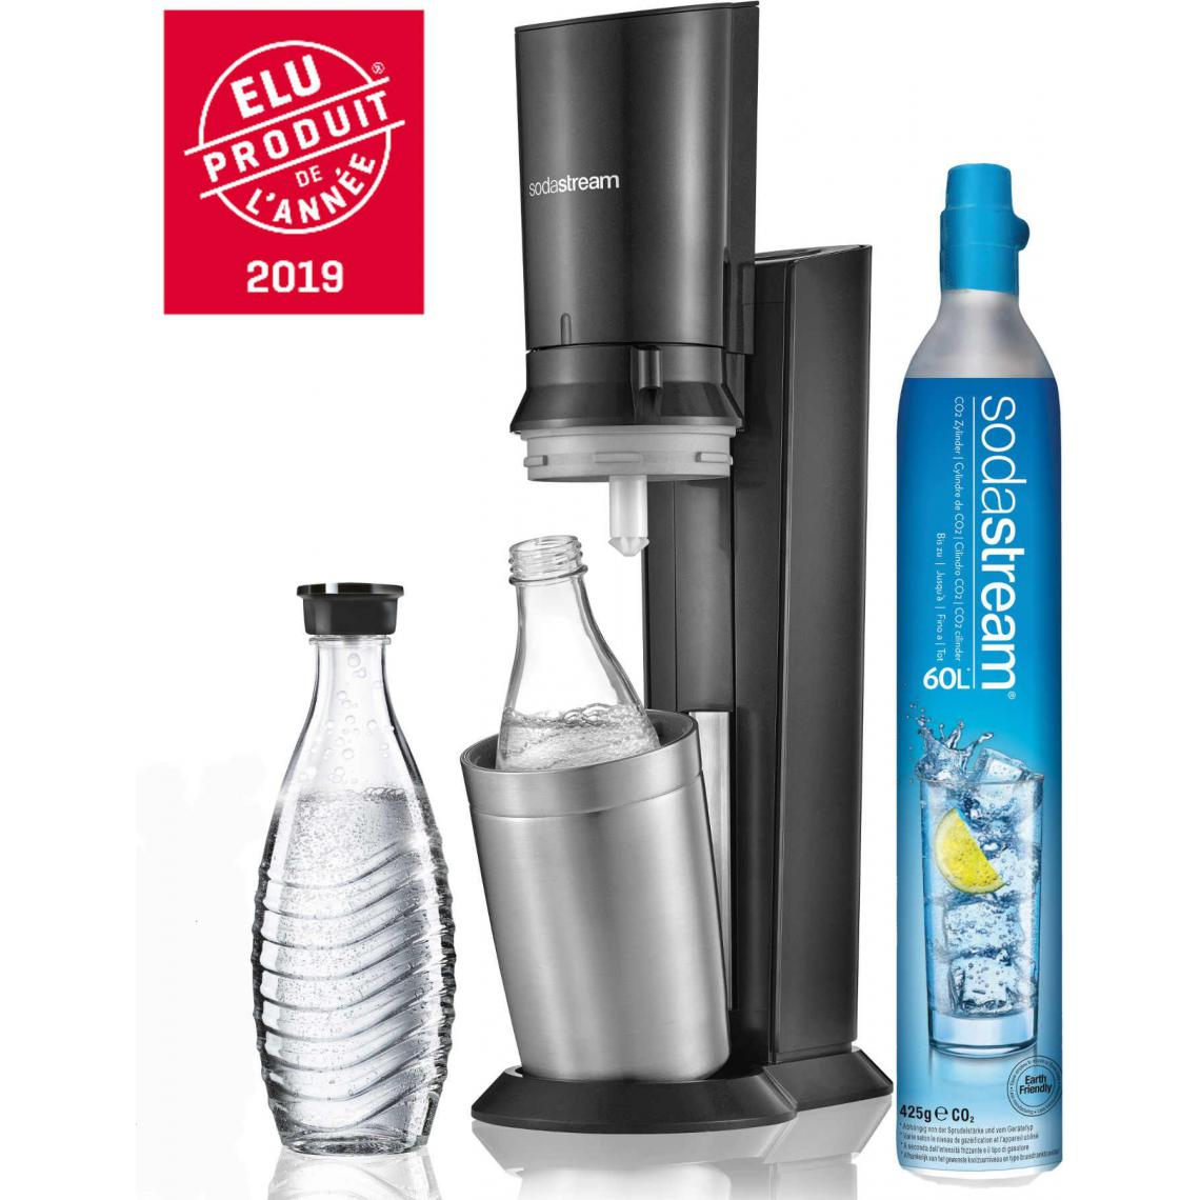 Sodastream sodastream - crystalnp